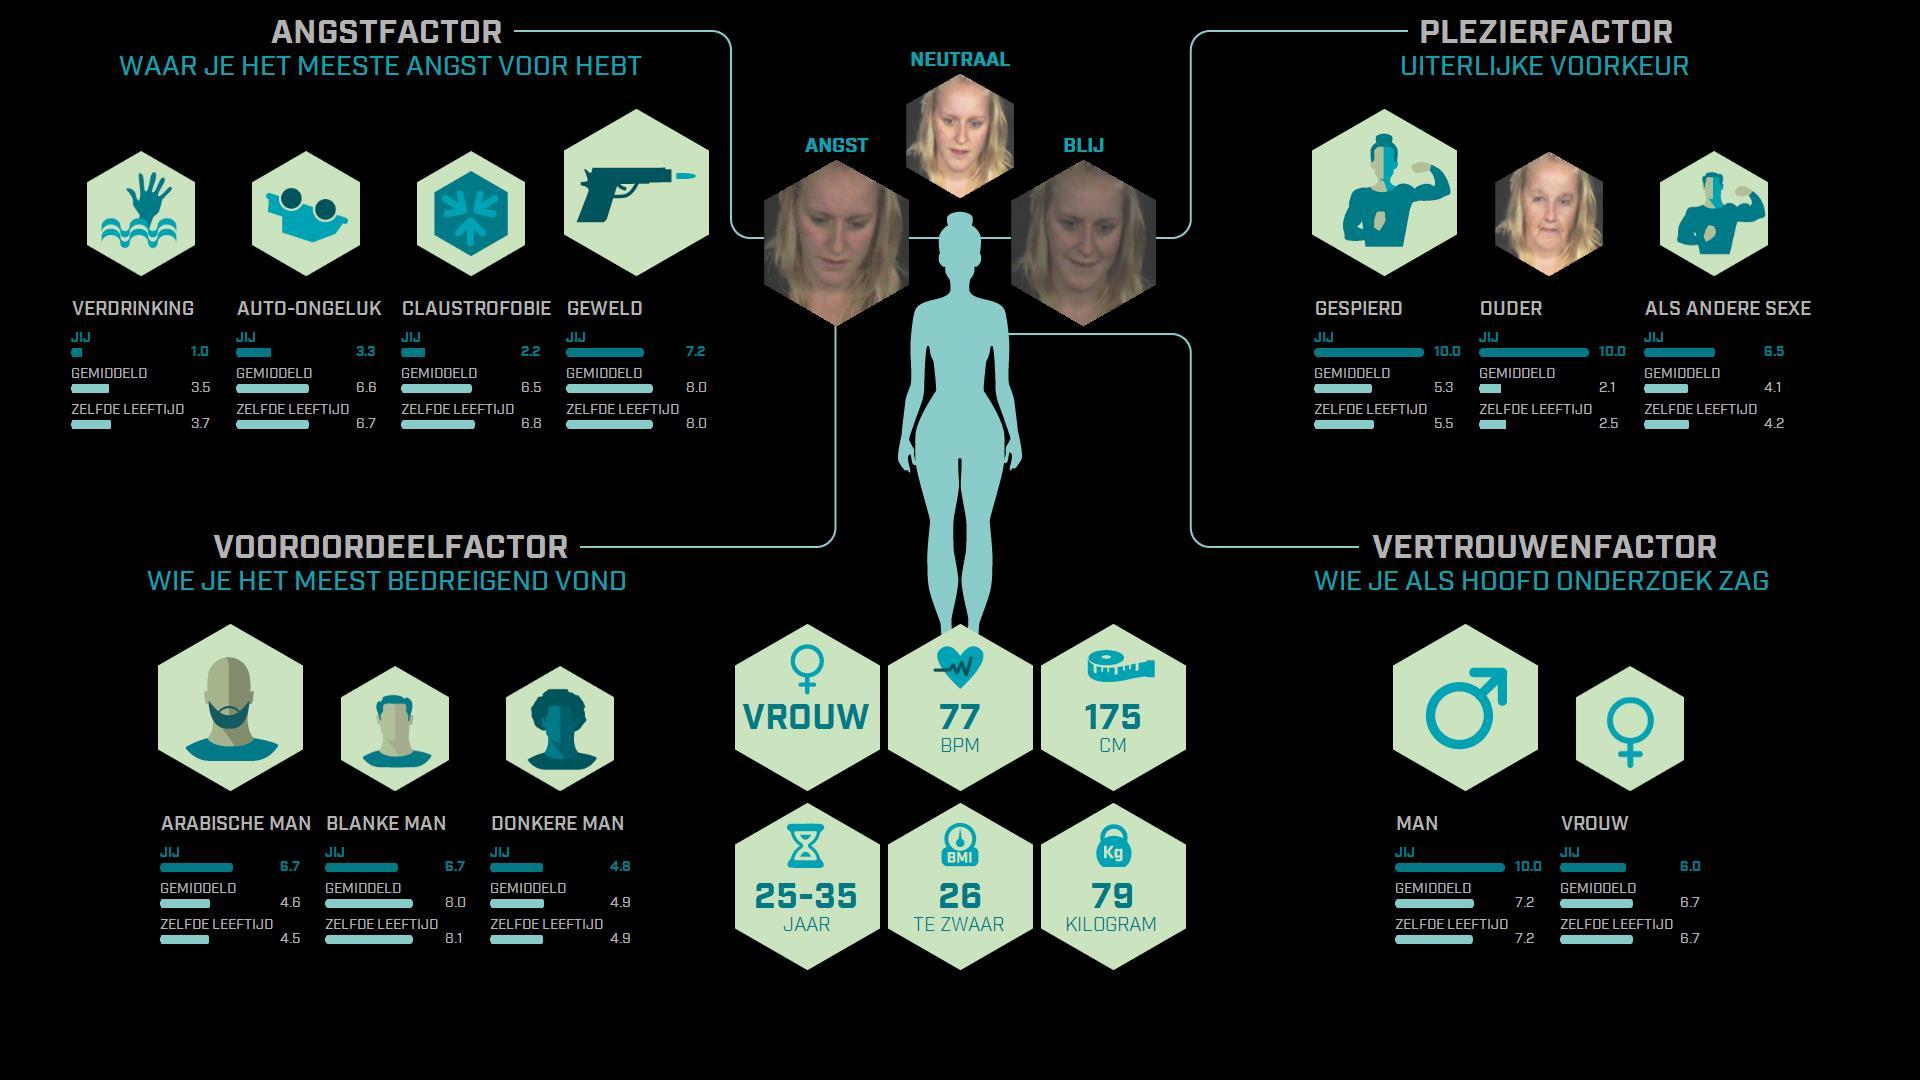 Profile Petri